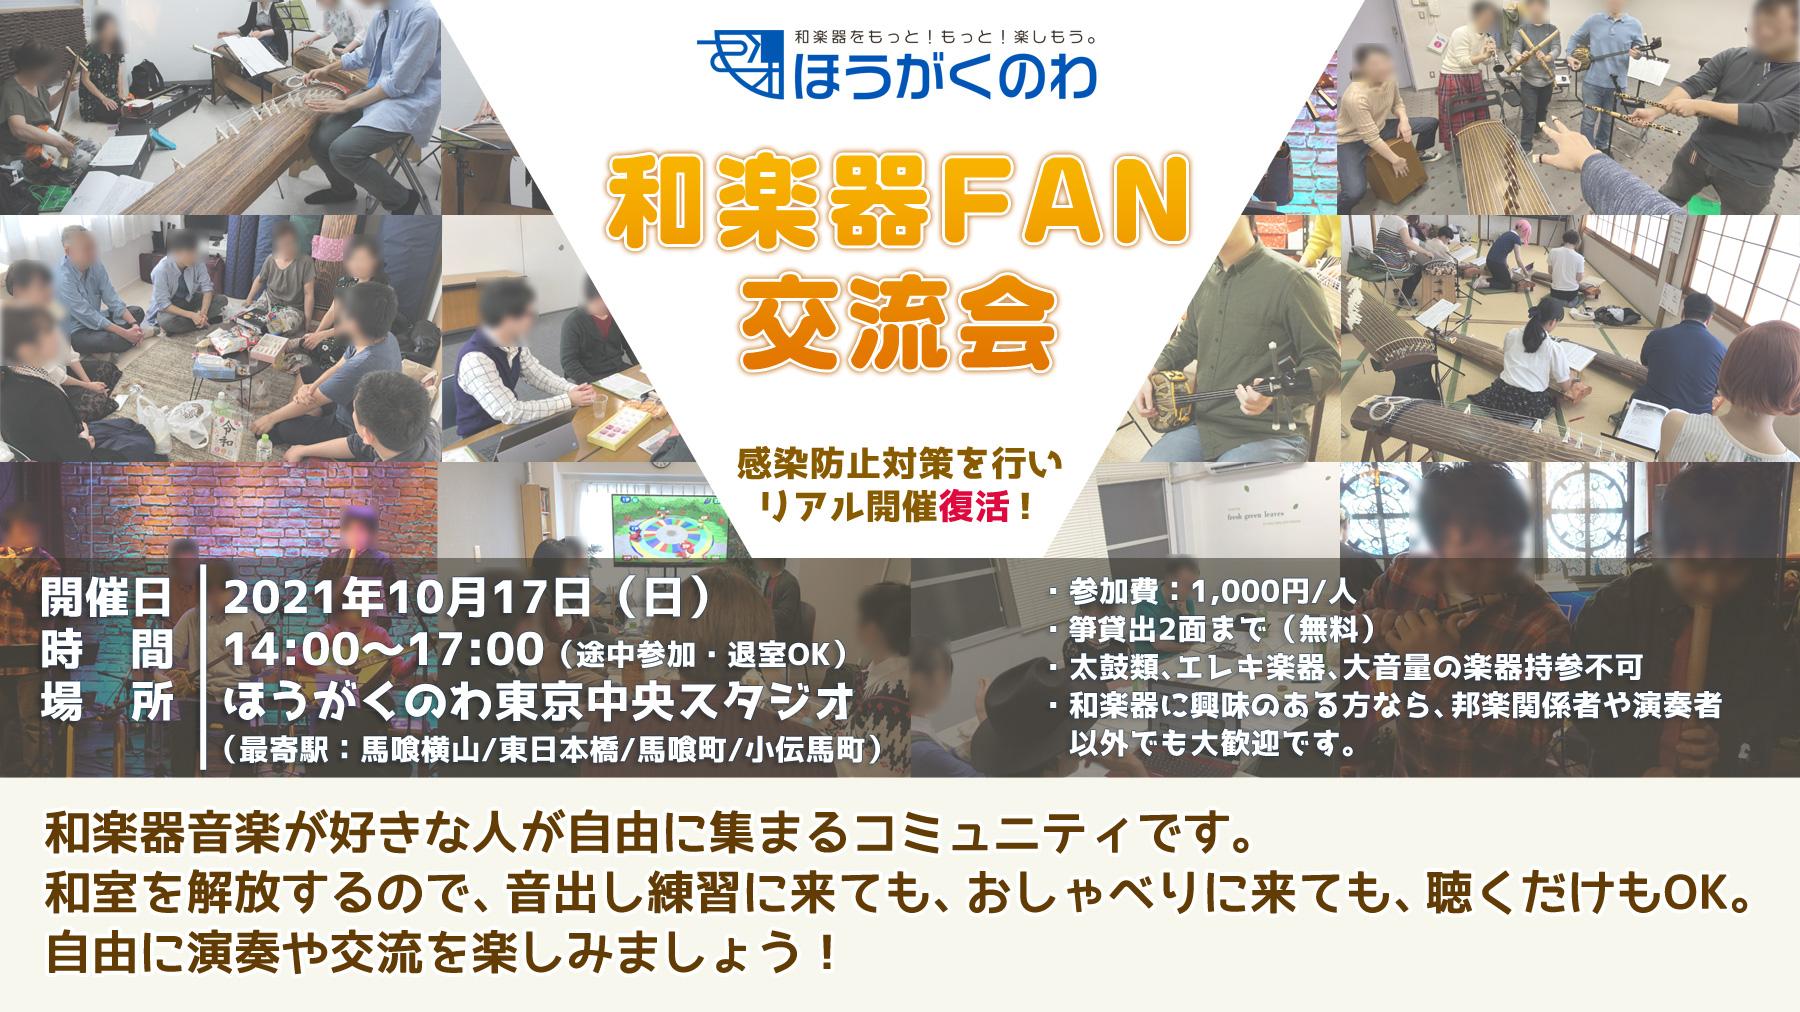 和楽器FAN交流会(2021年10月)